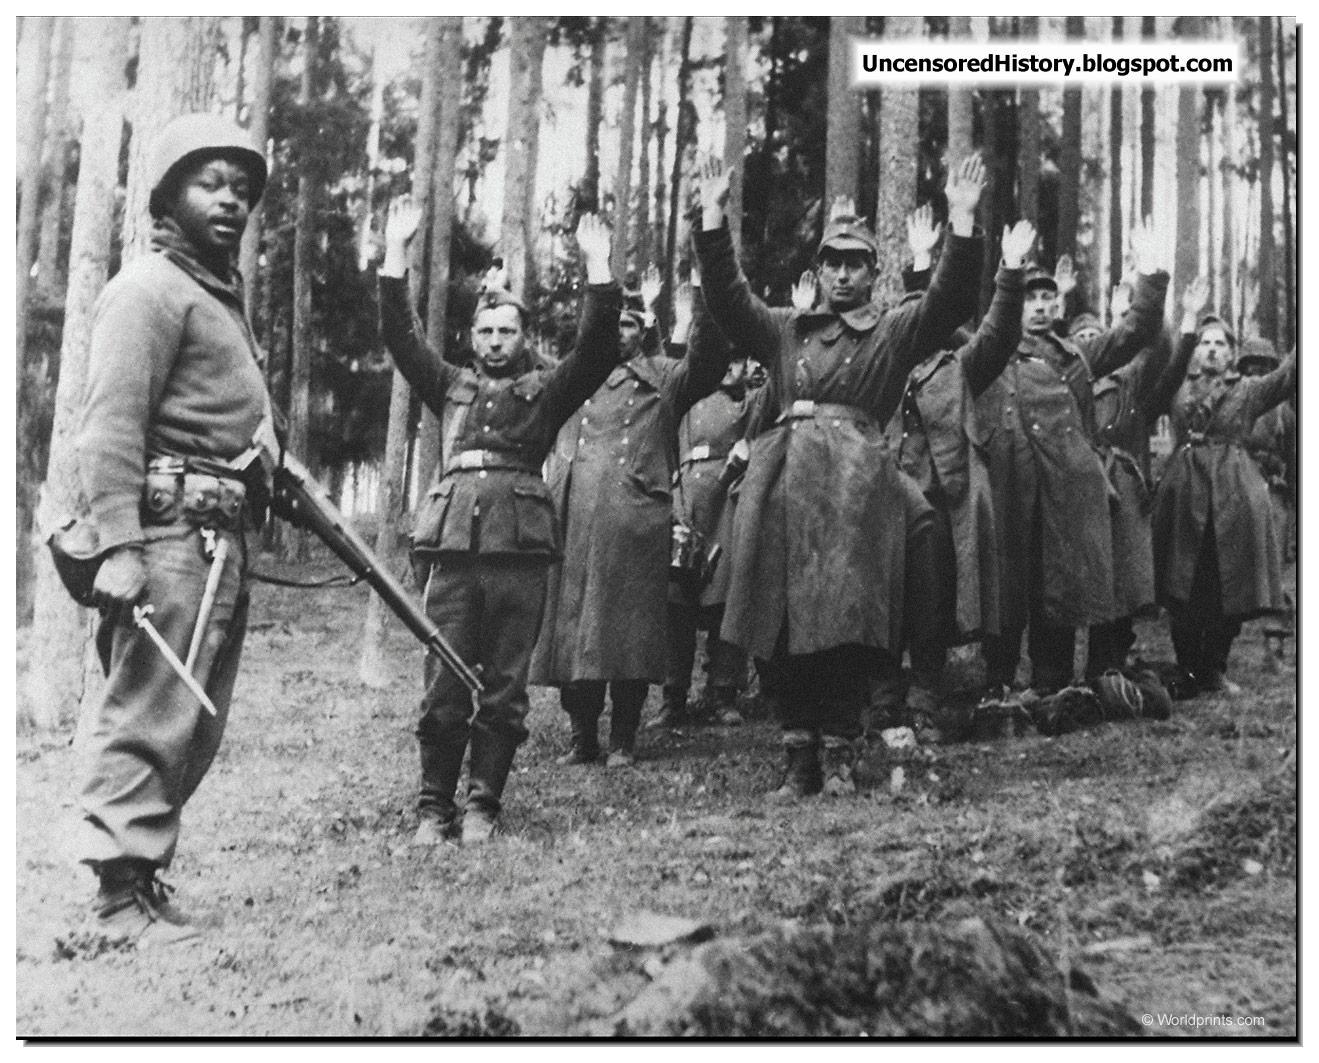 German prisoners waffen ss shot american soldiers